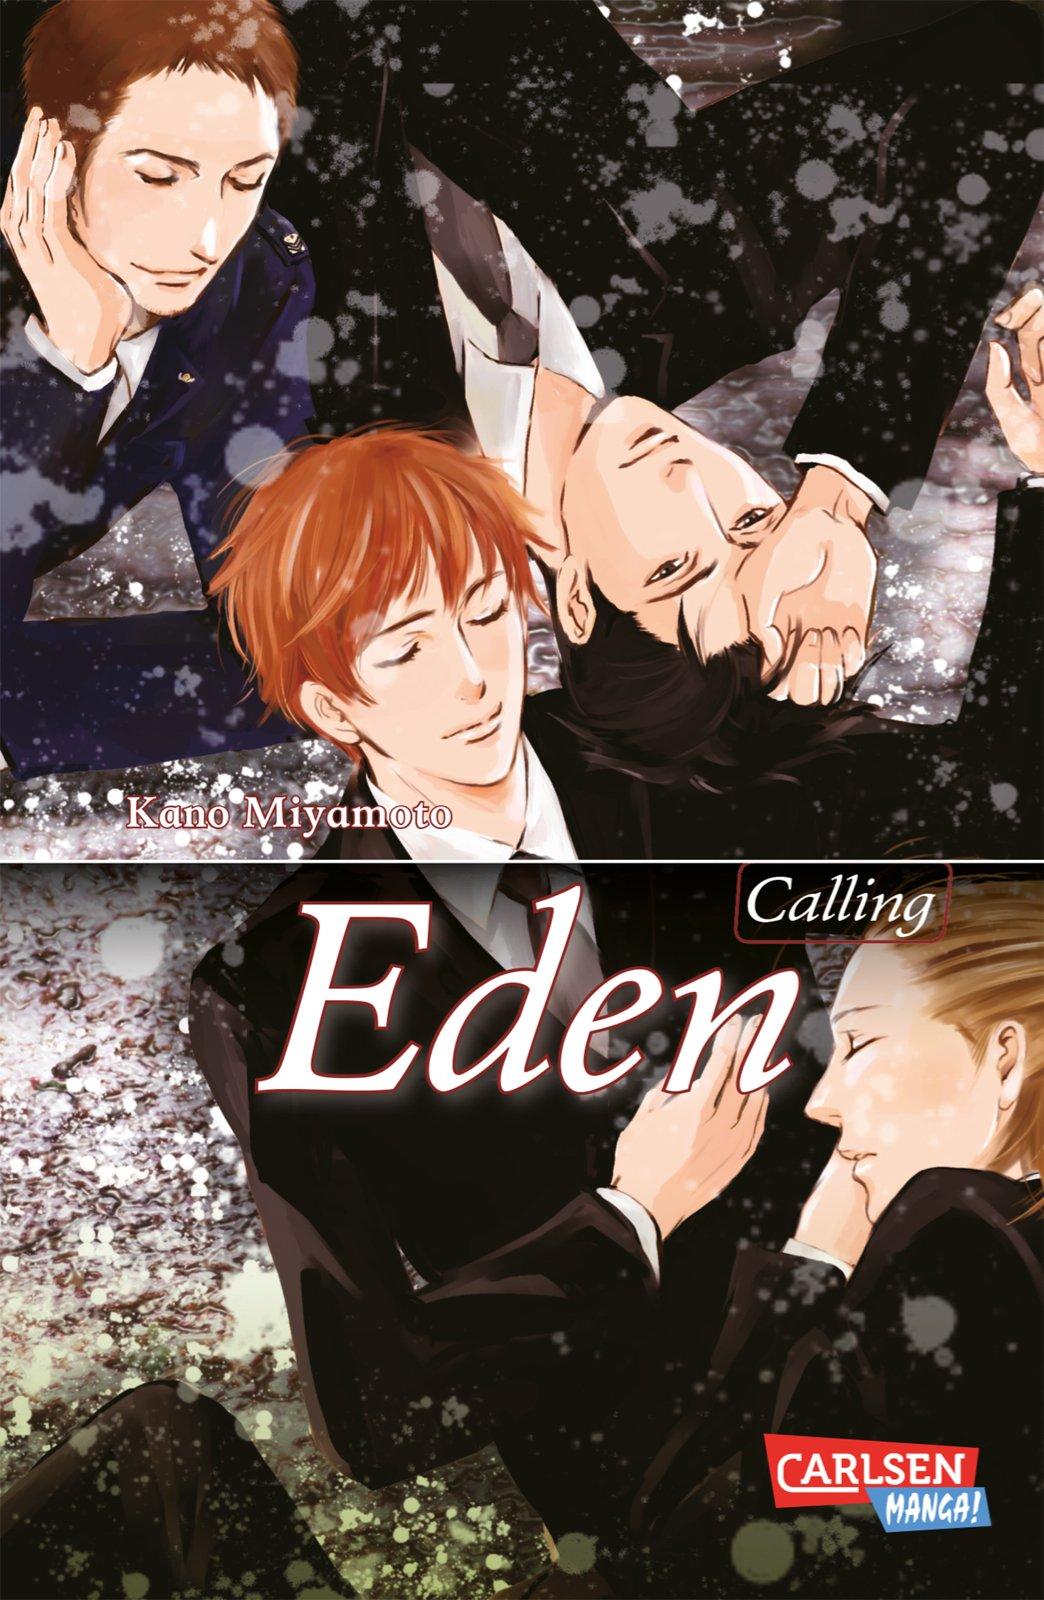 Calling, Band 3